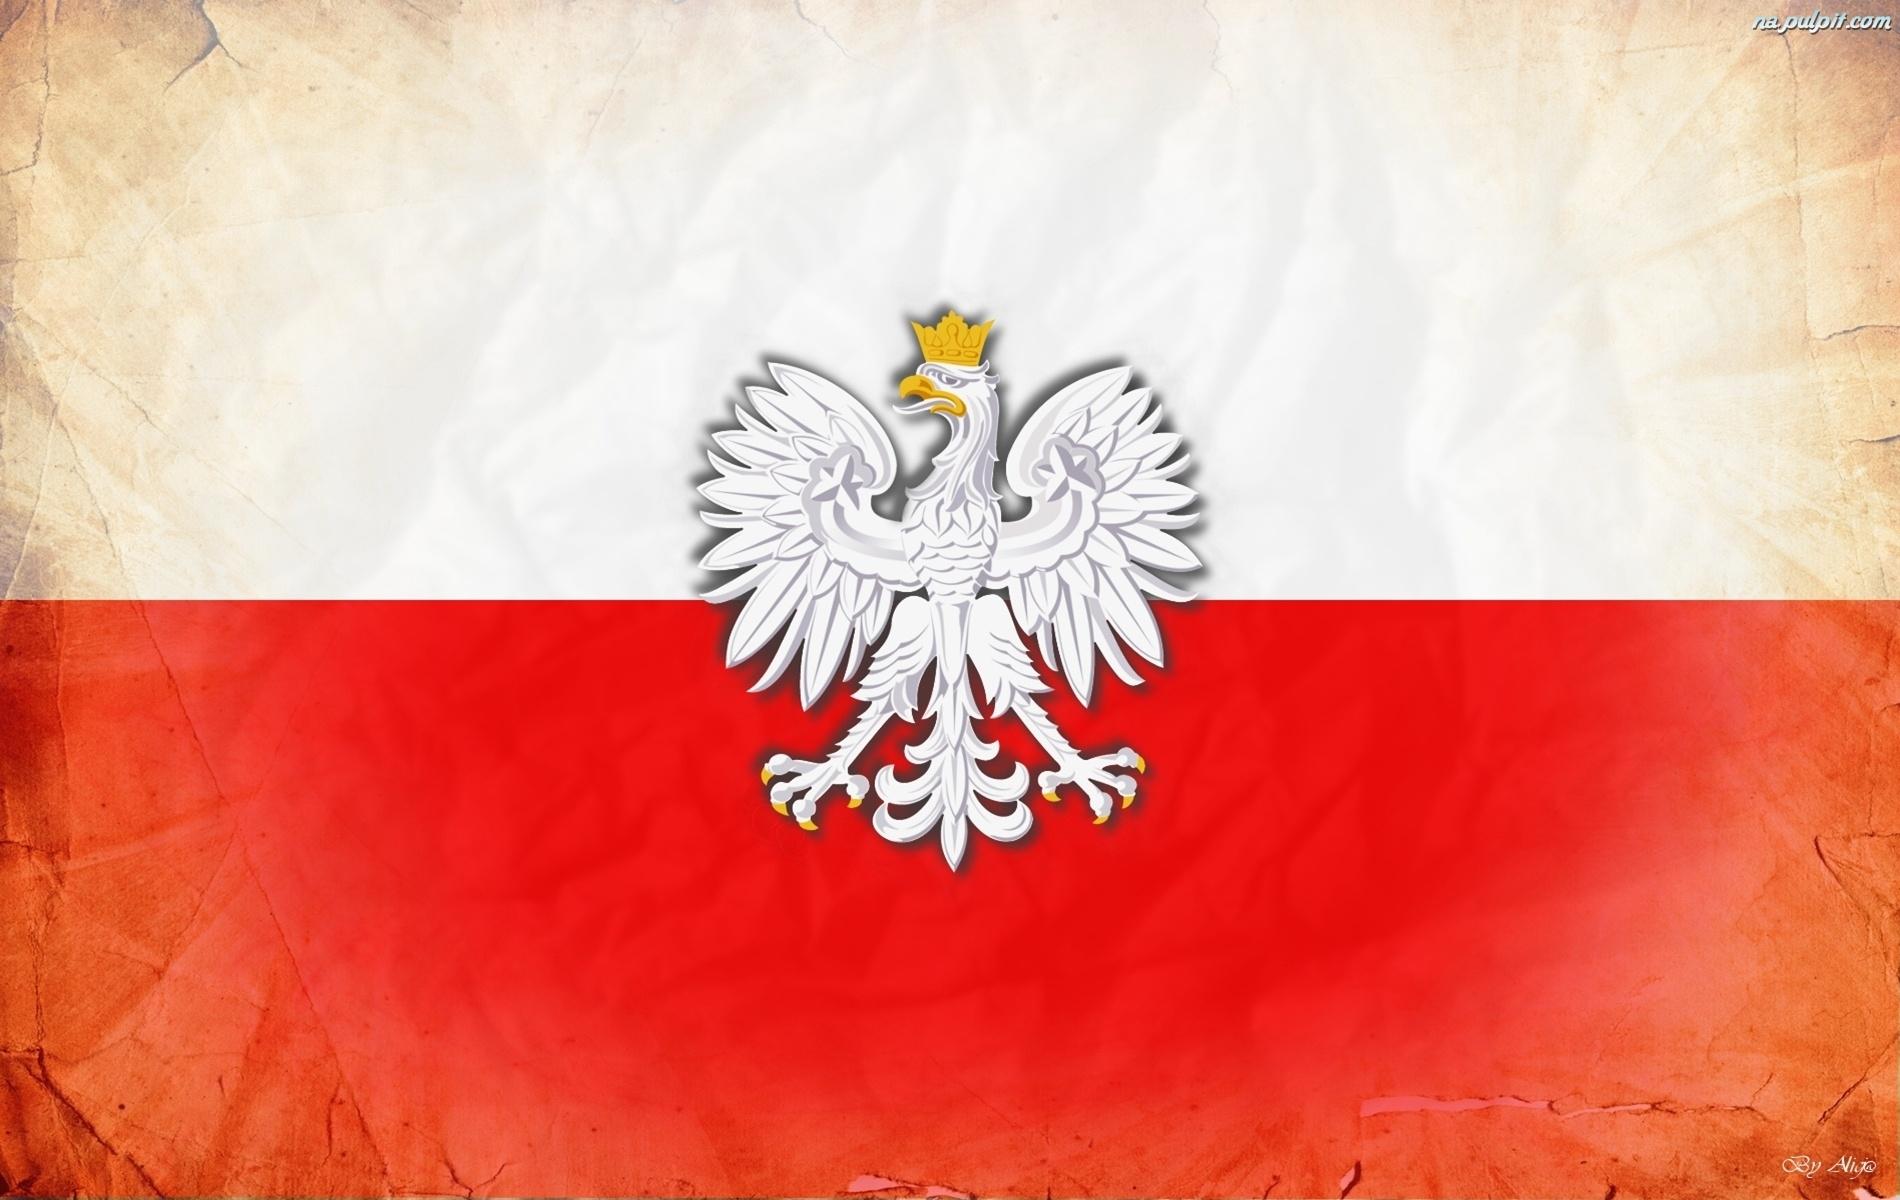 polska-godlo-flaga